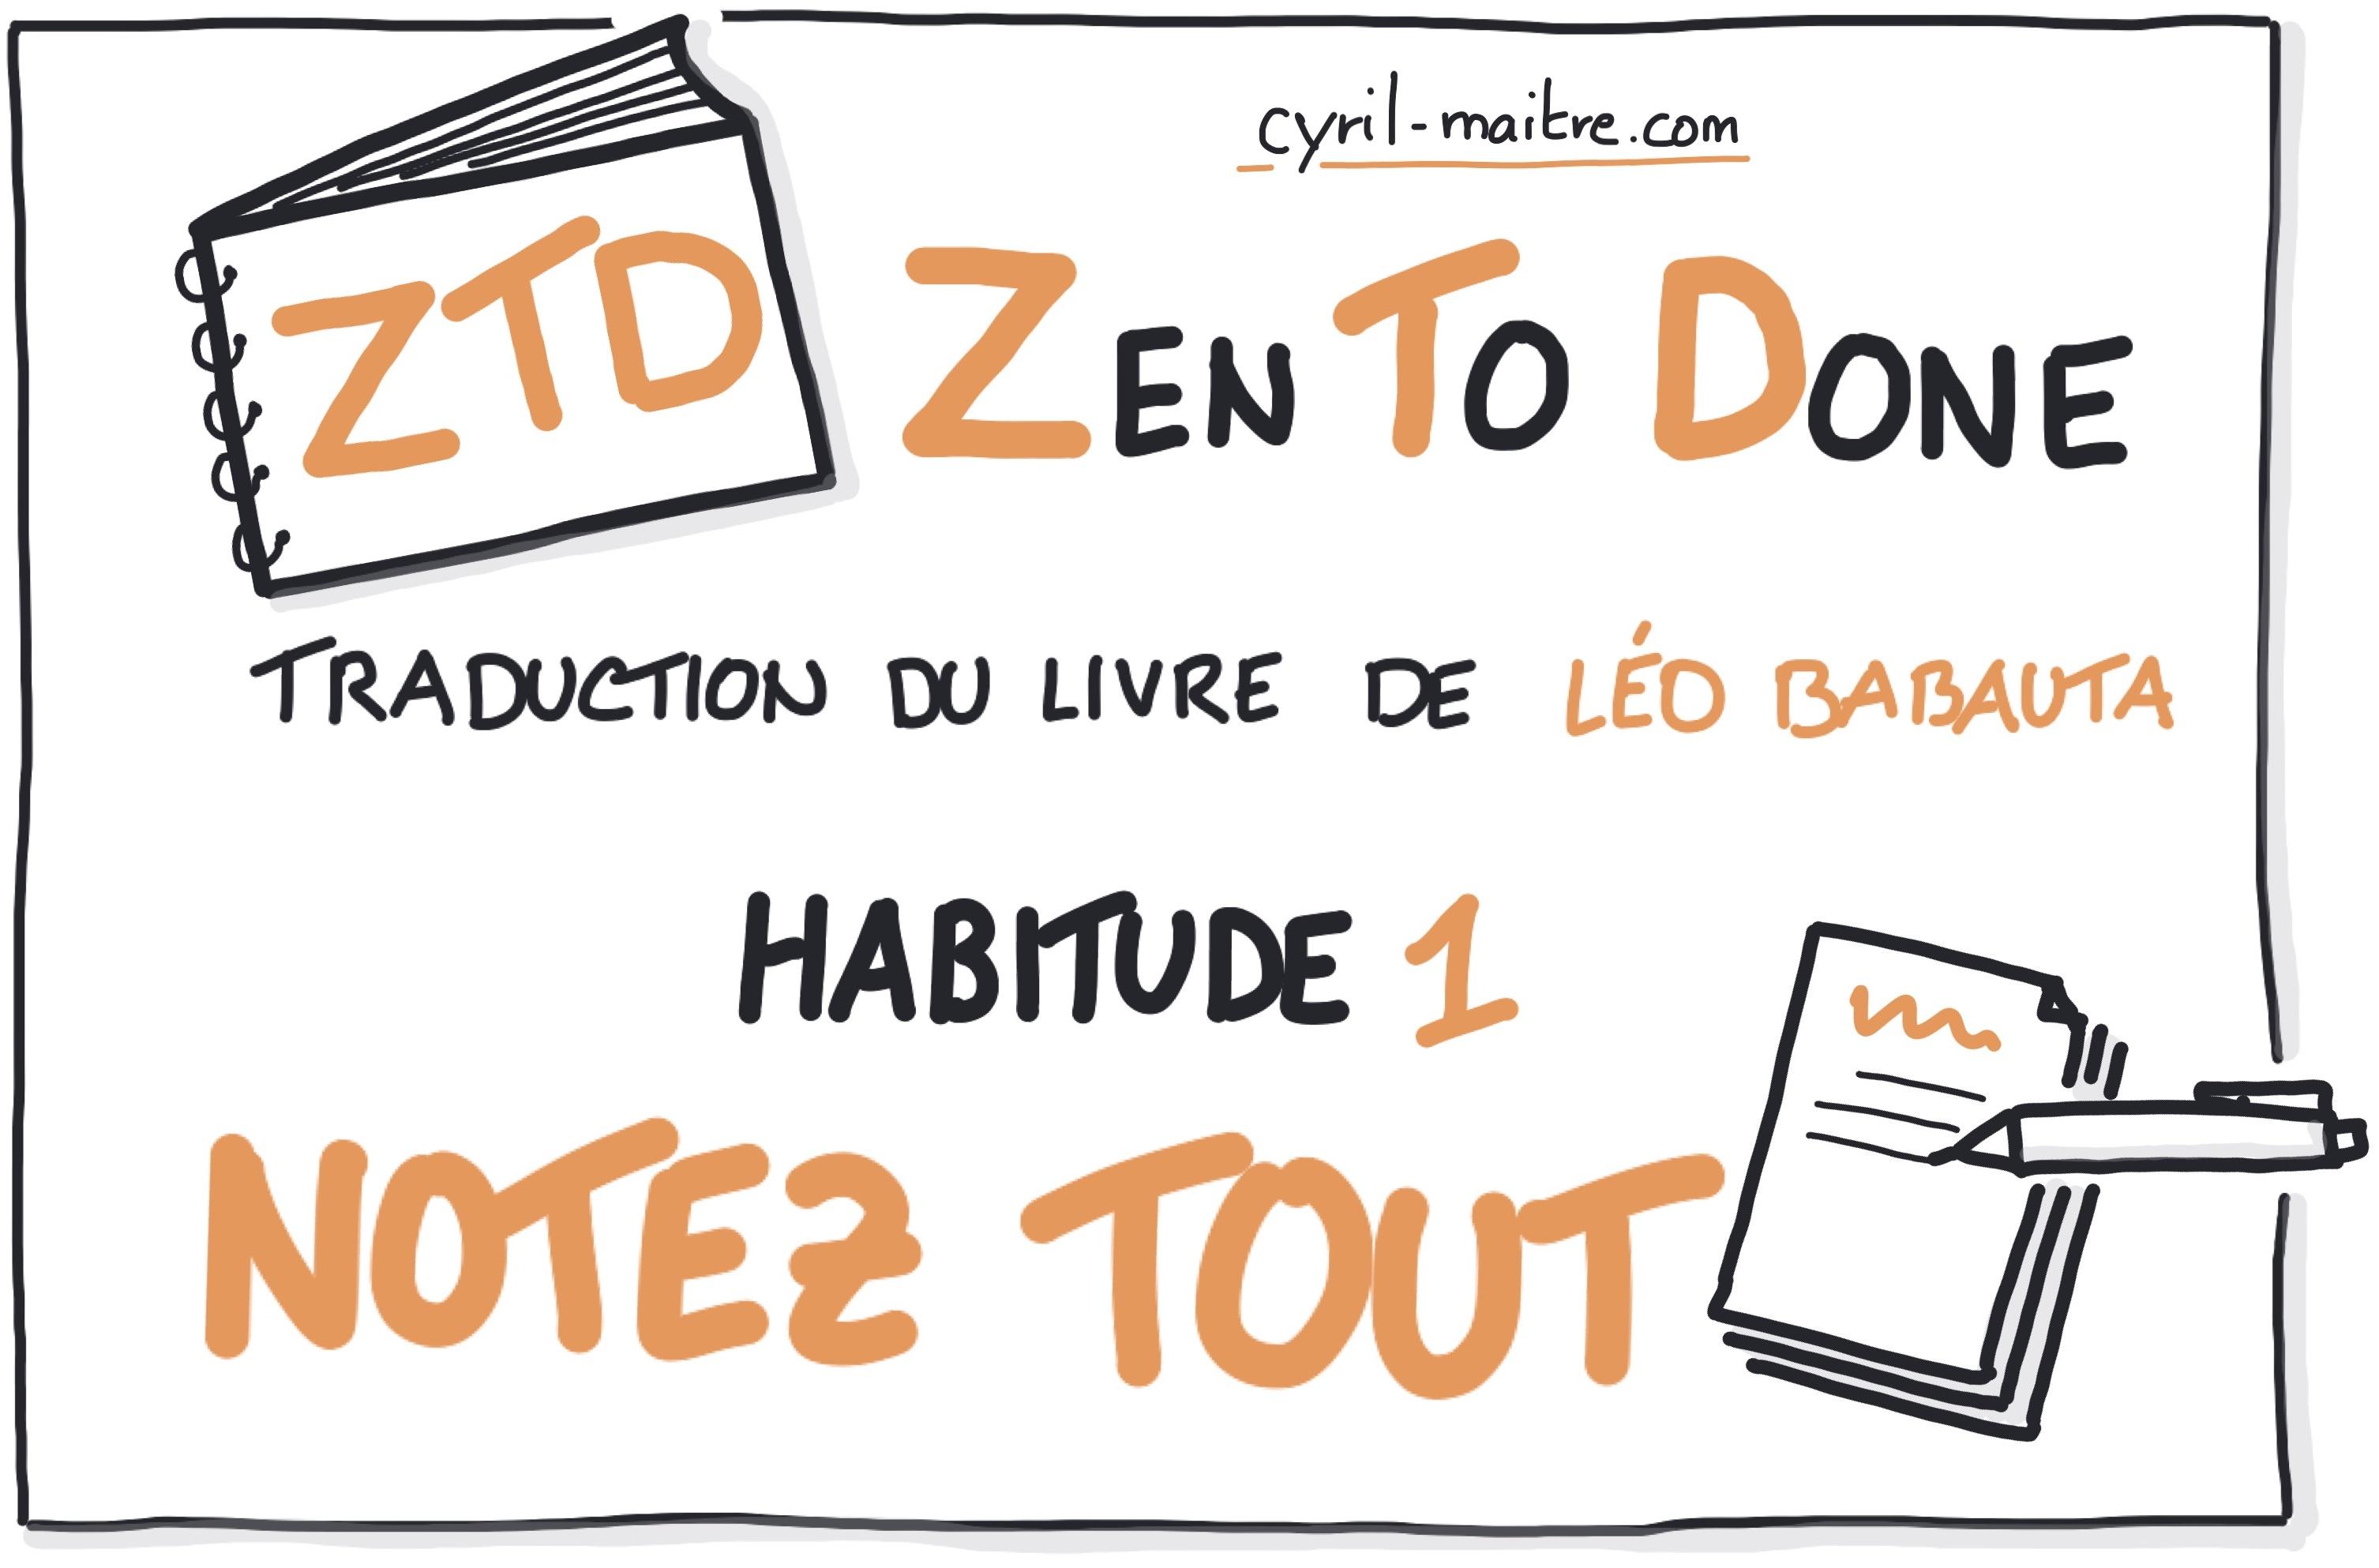 Zen To Done habitude 1 : tout noter